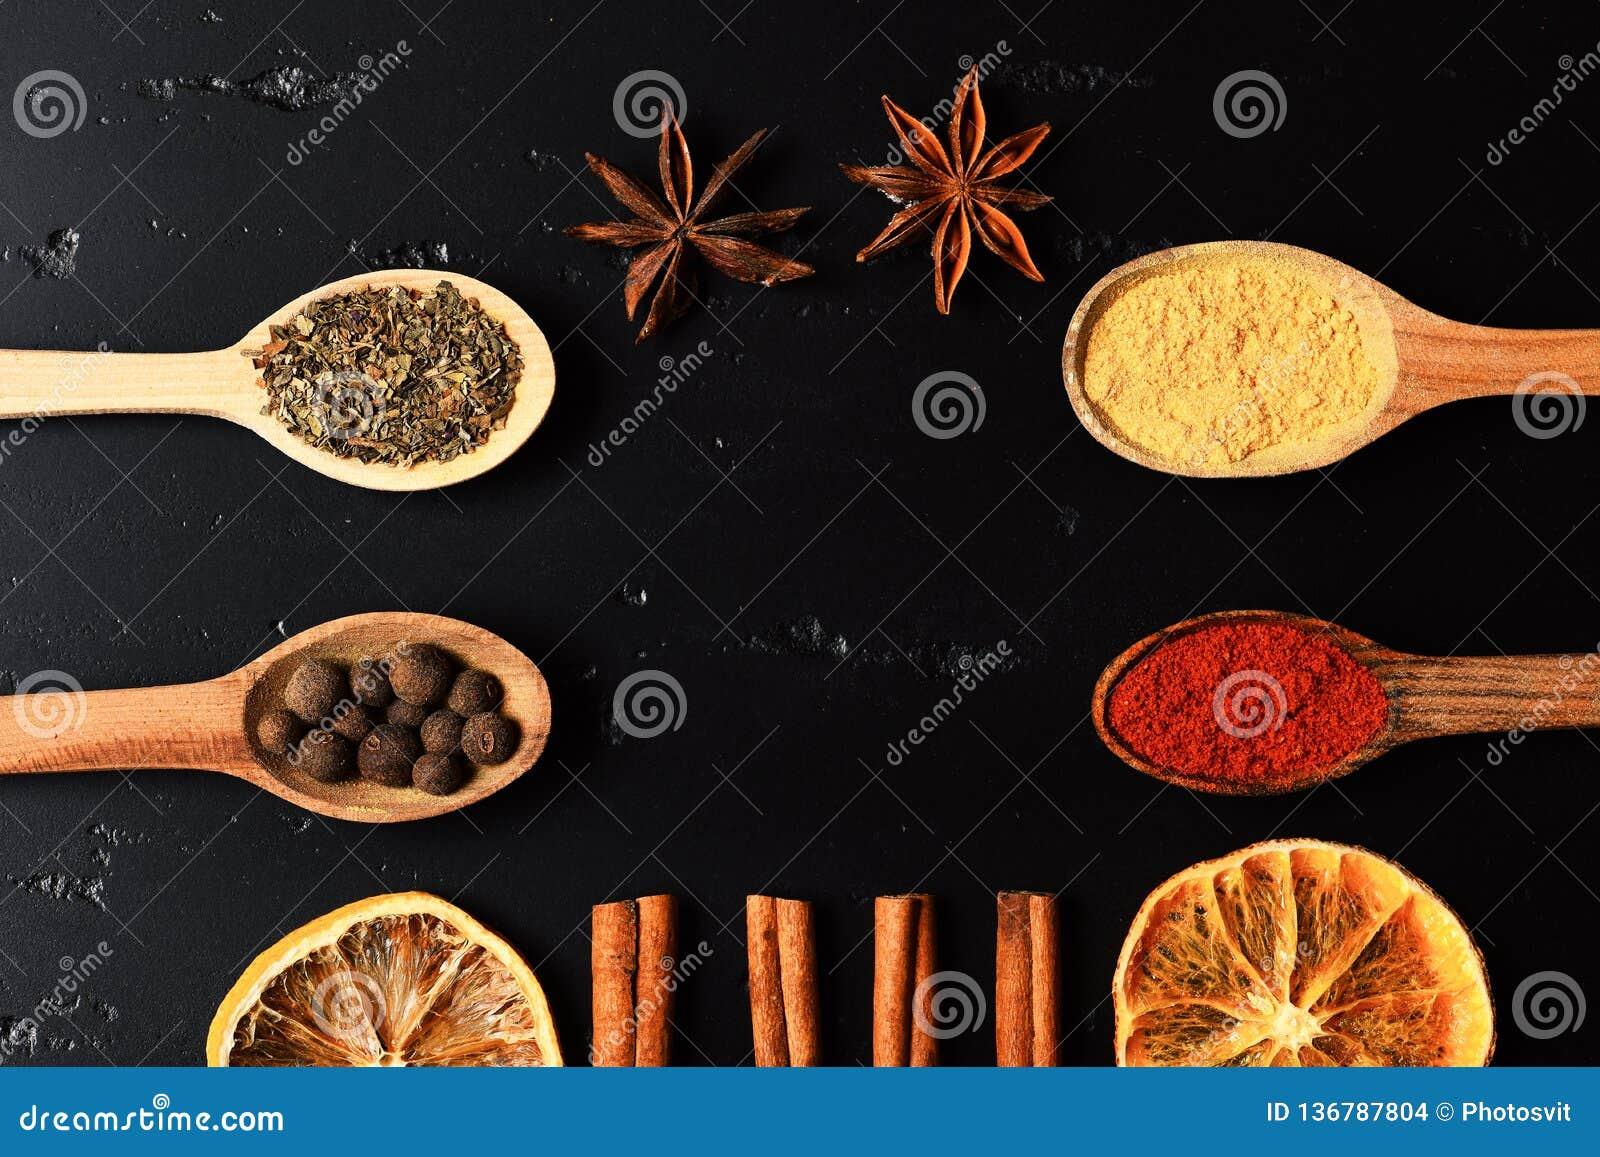 Samenstelling van specerij, hoogste mening Houten lepels met kruiden